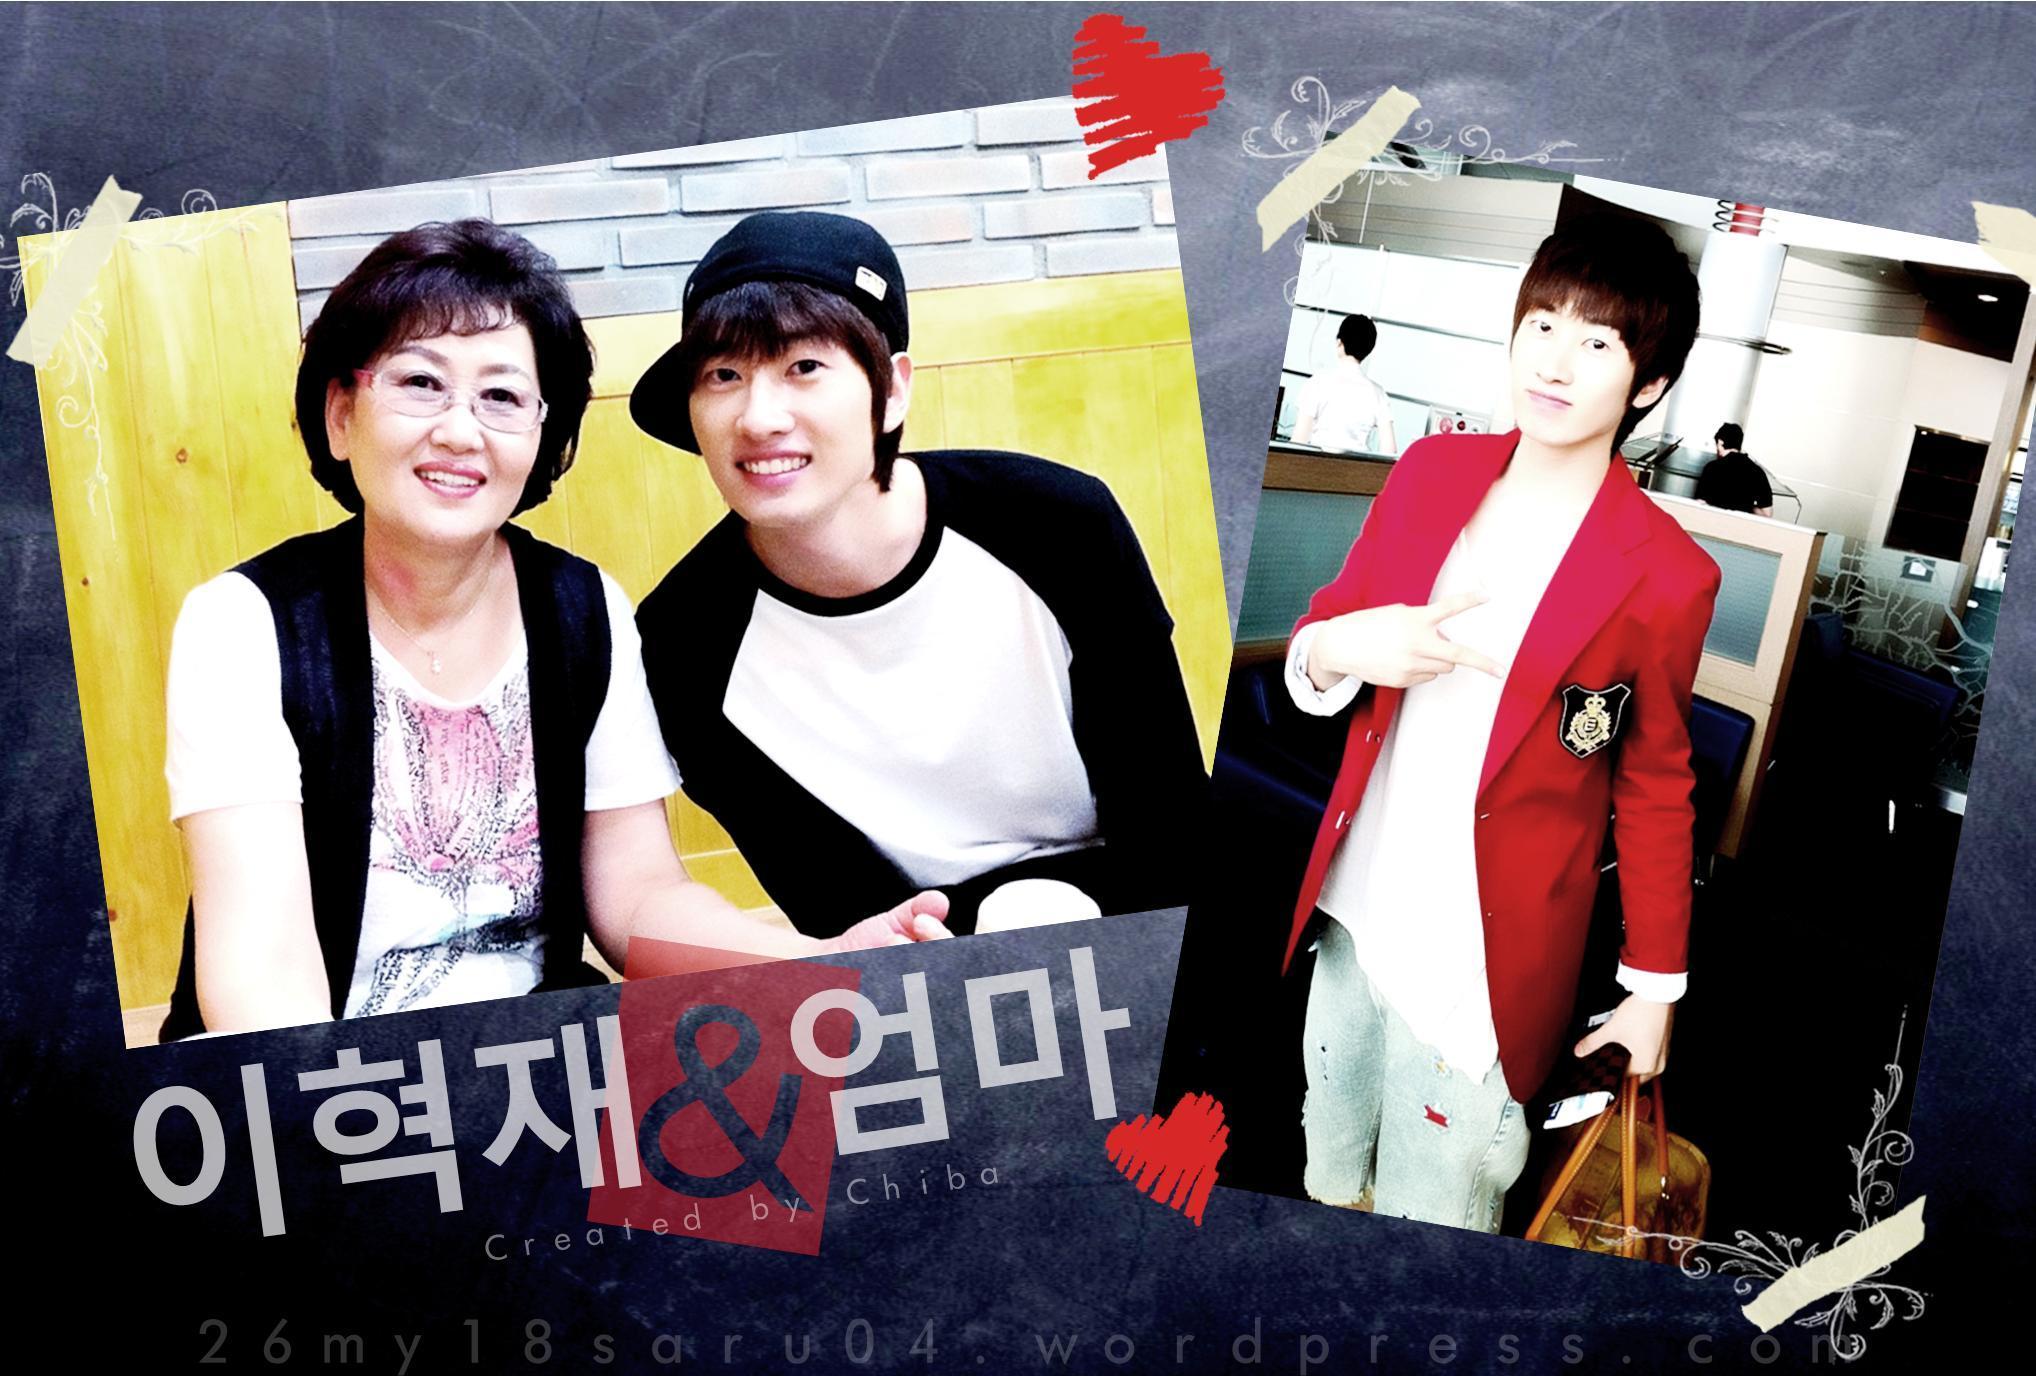 Pic] Eunhyuk Wallpaper by chiba   ~Mr.Simple*in*Beautiful World